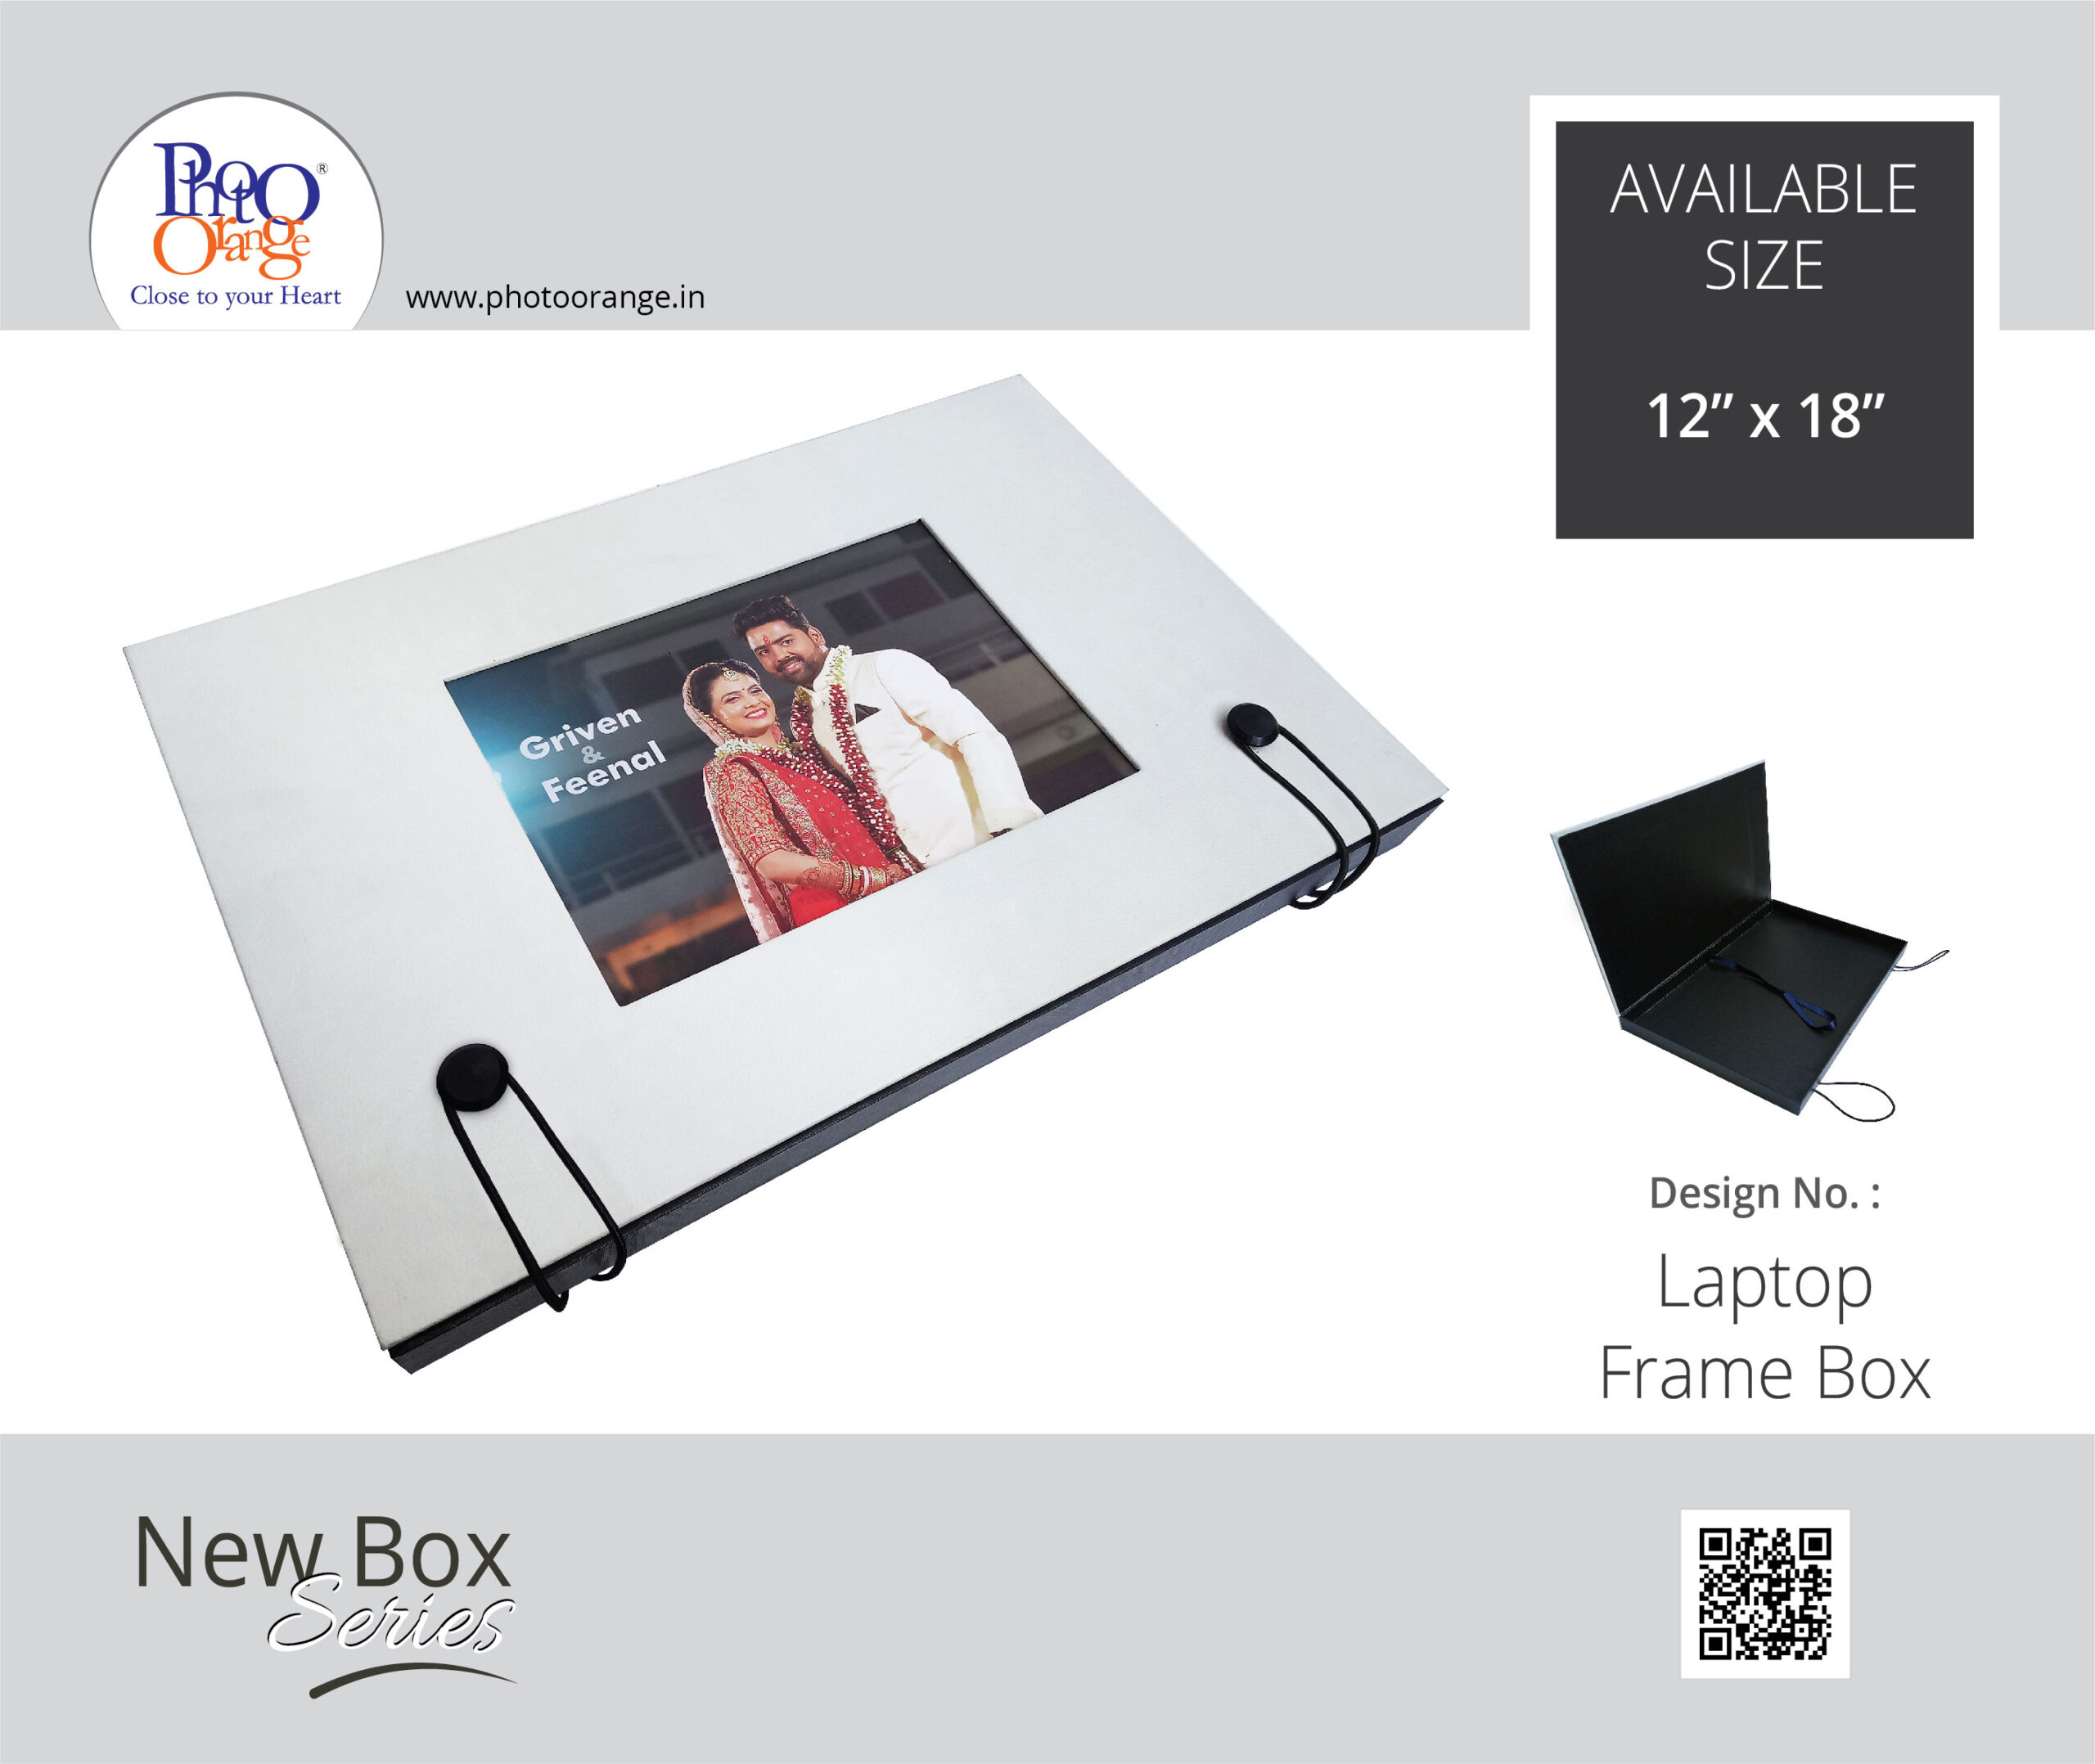 Laptop Frame Box